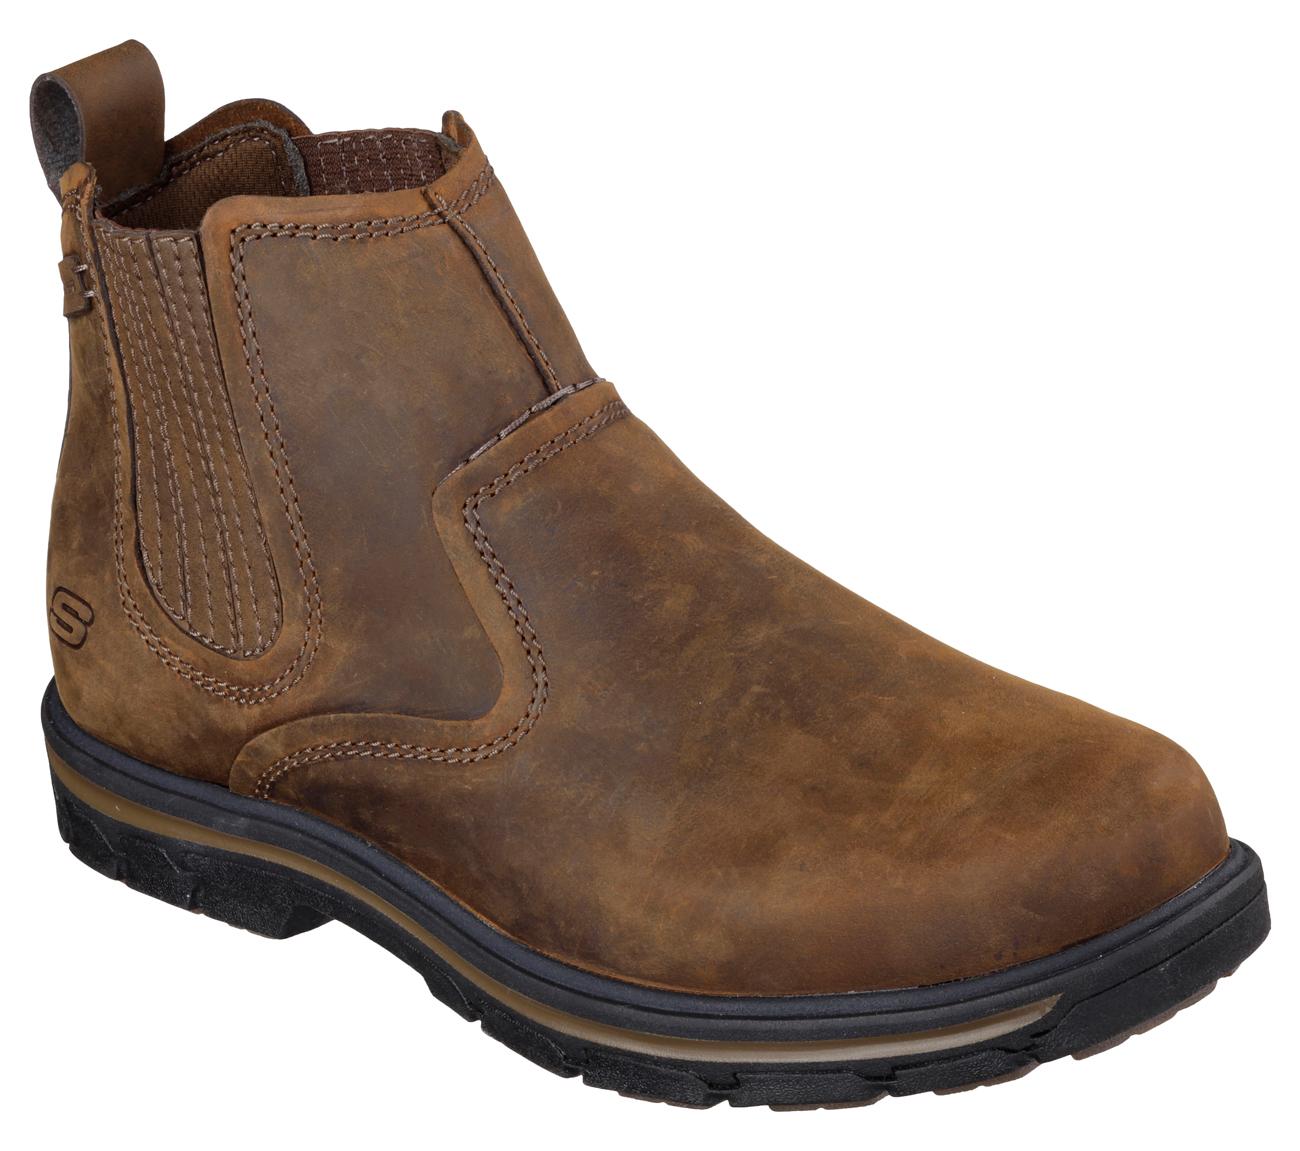 Cdb S Shoes